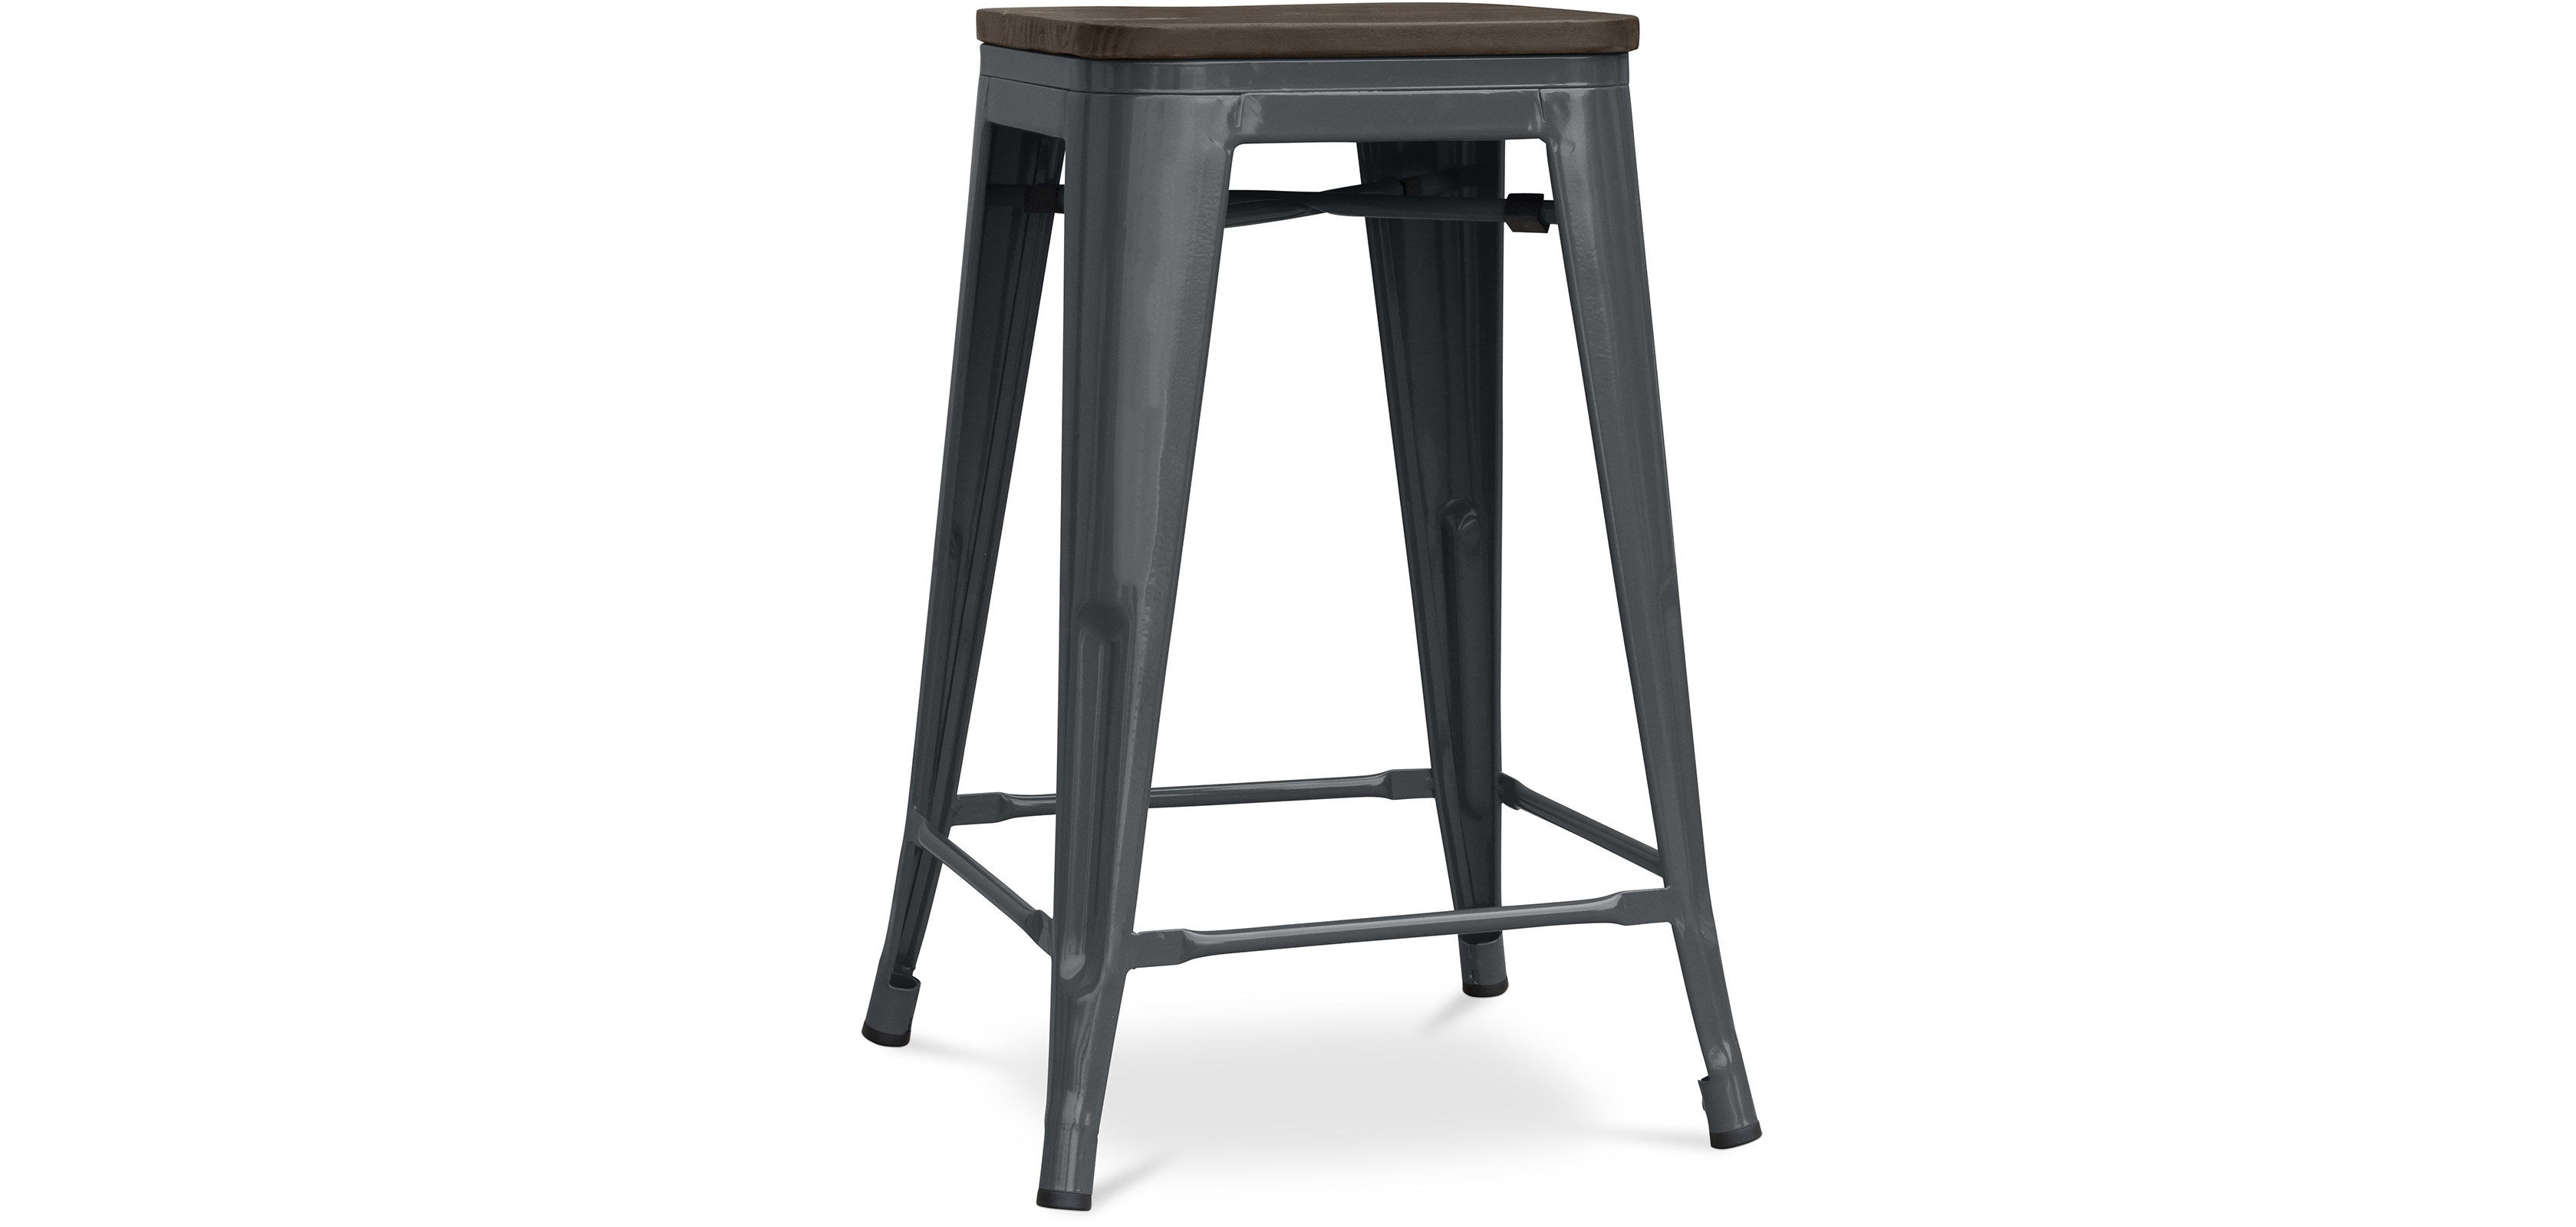 tabouret tolix assise en bois xavier pauchard. Black Bedroom Furniture Sets. Home Design Ideas